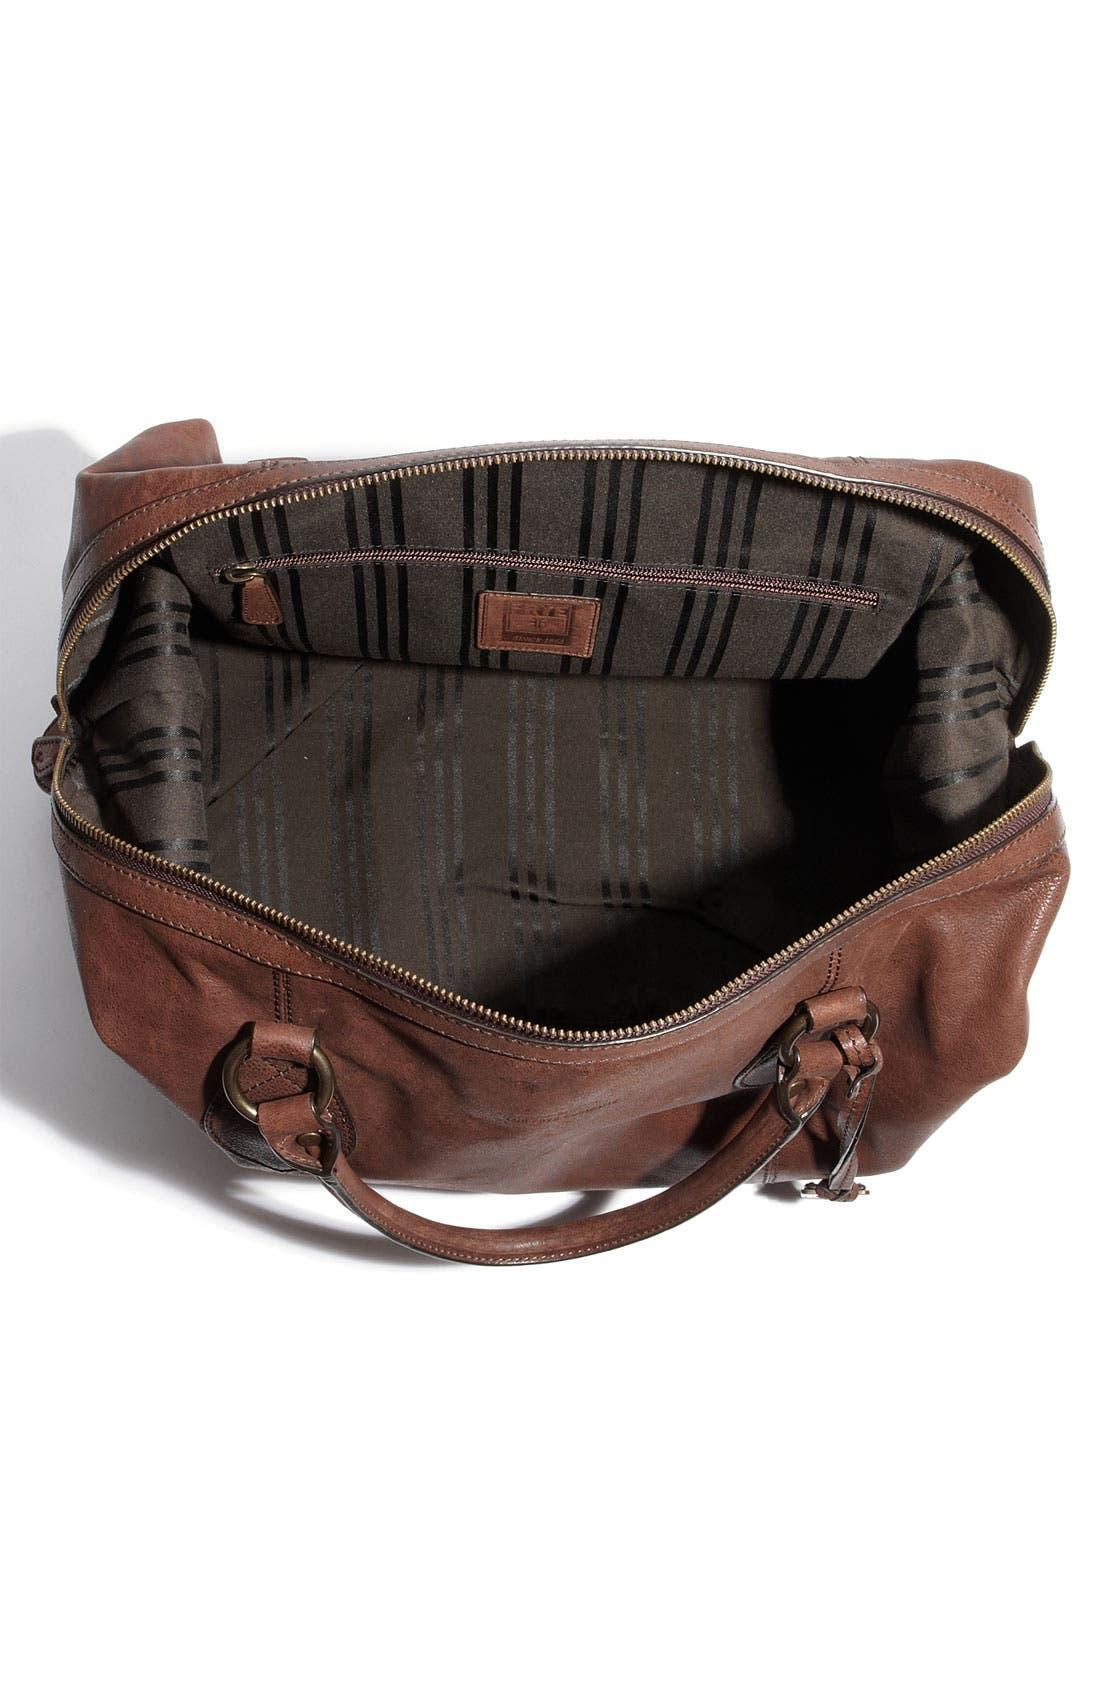 Alternate Image 3  - Frye 'Logan' Leather Overnight Bag